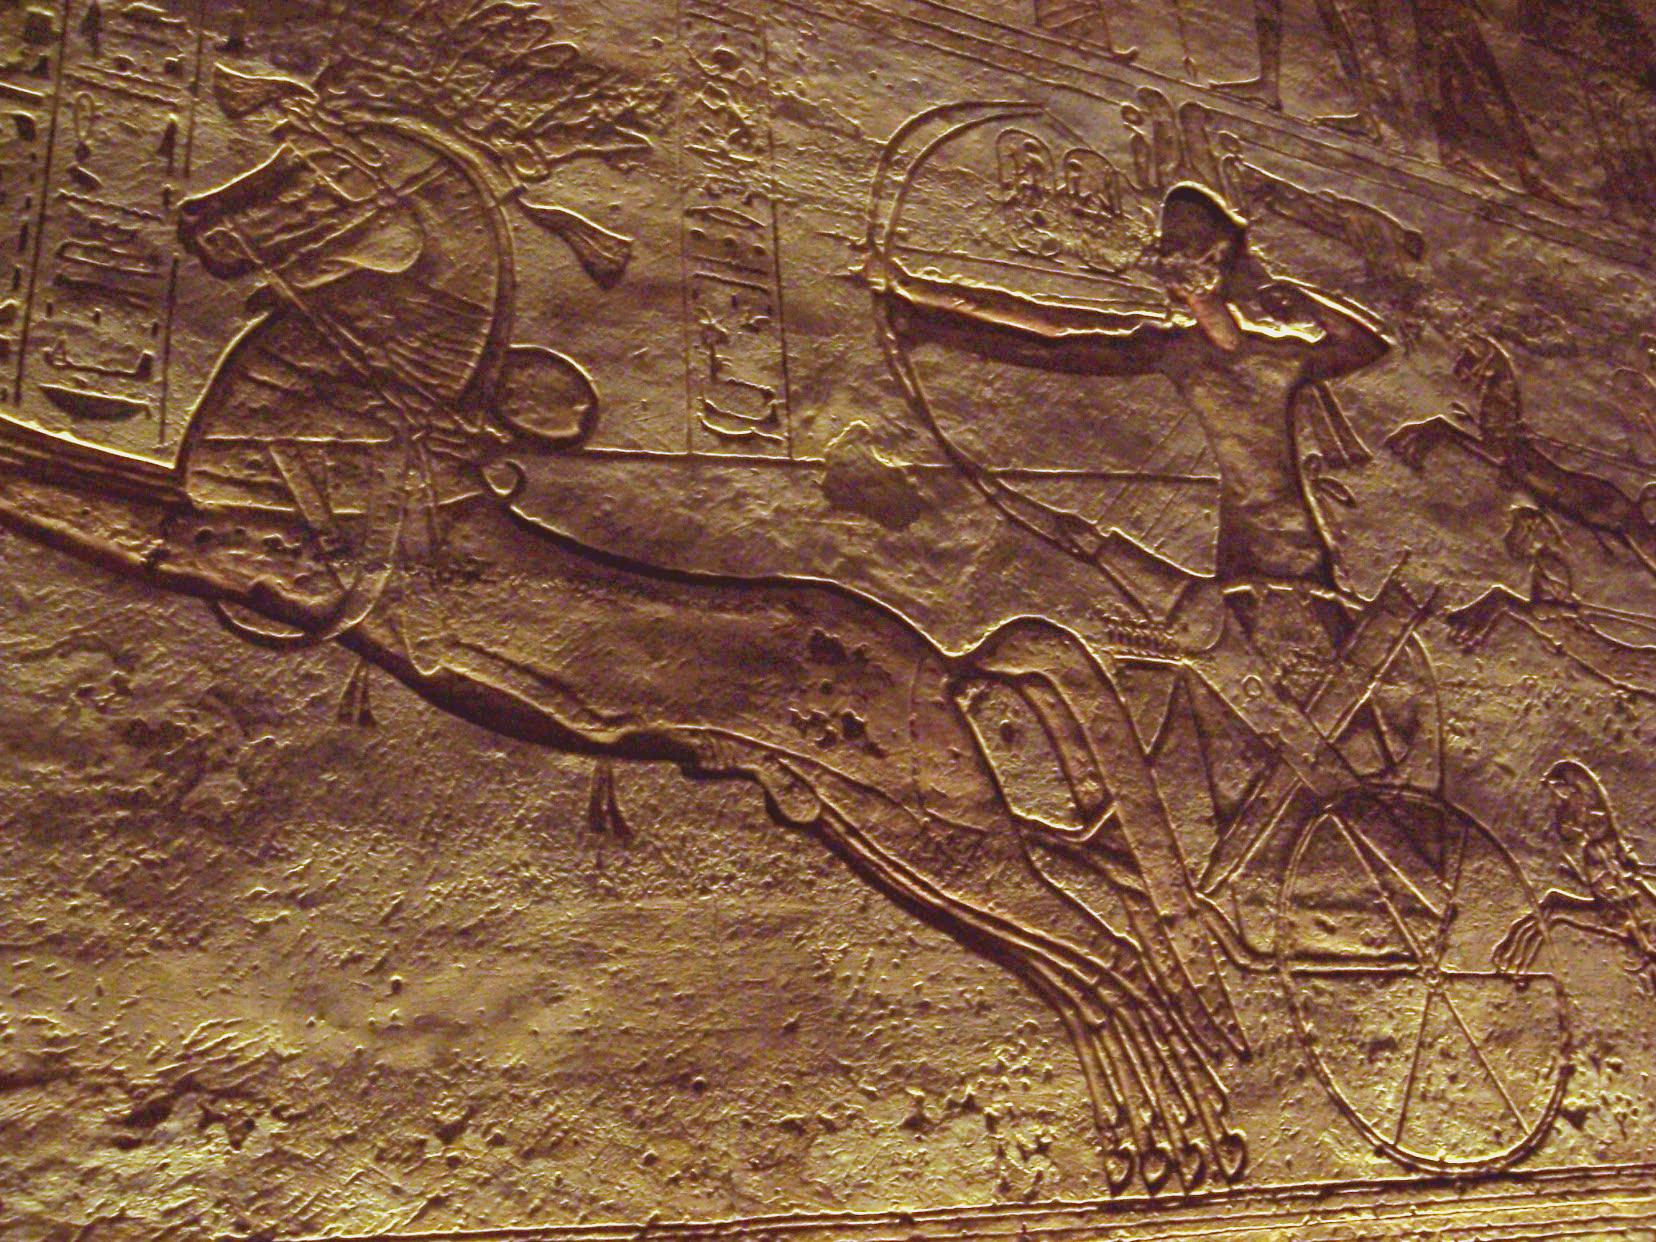 https://upload.wikimedia.org/wikipedia/commons/9/9b/AbuSimbelTempleEgypt_2007jan9-42_byDanielCsorfoly.JPG